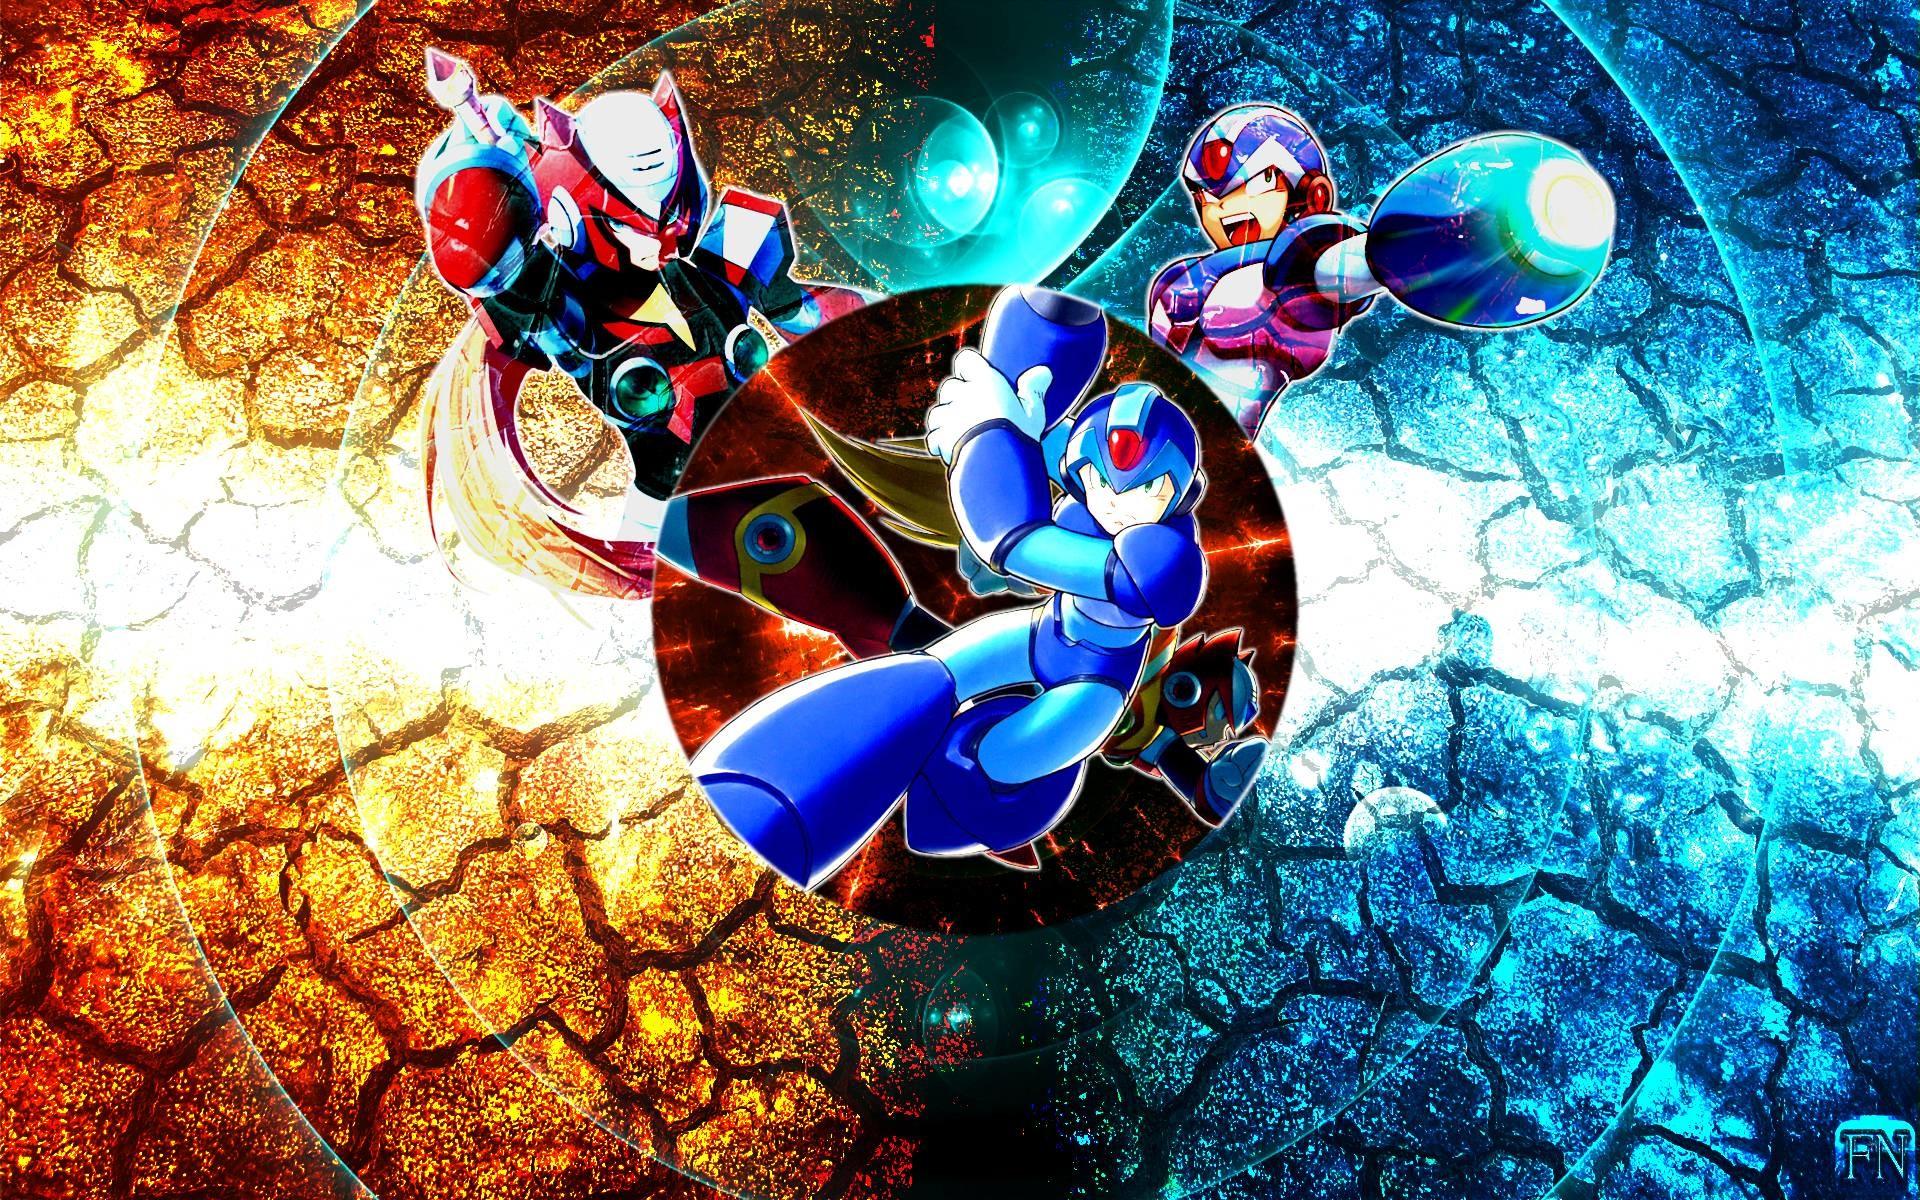 Megaman X Wallpaper by FRUITYNITE on DeviantArt